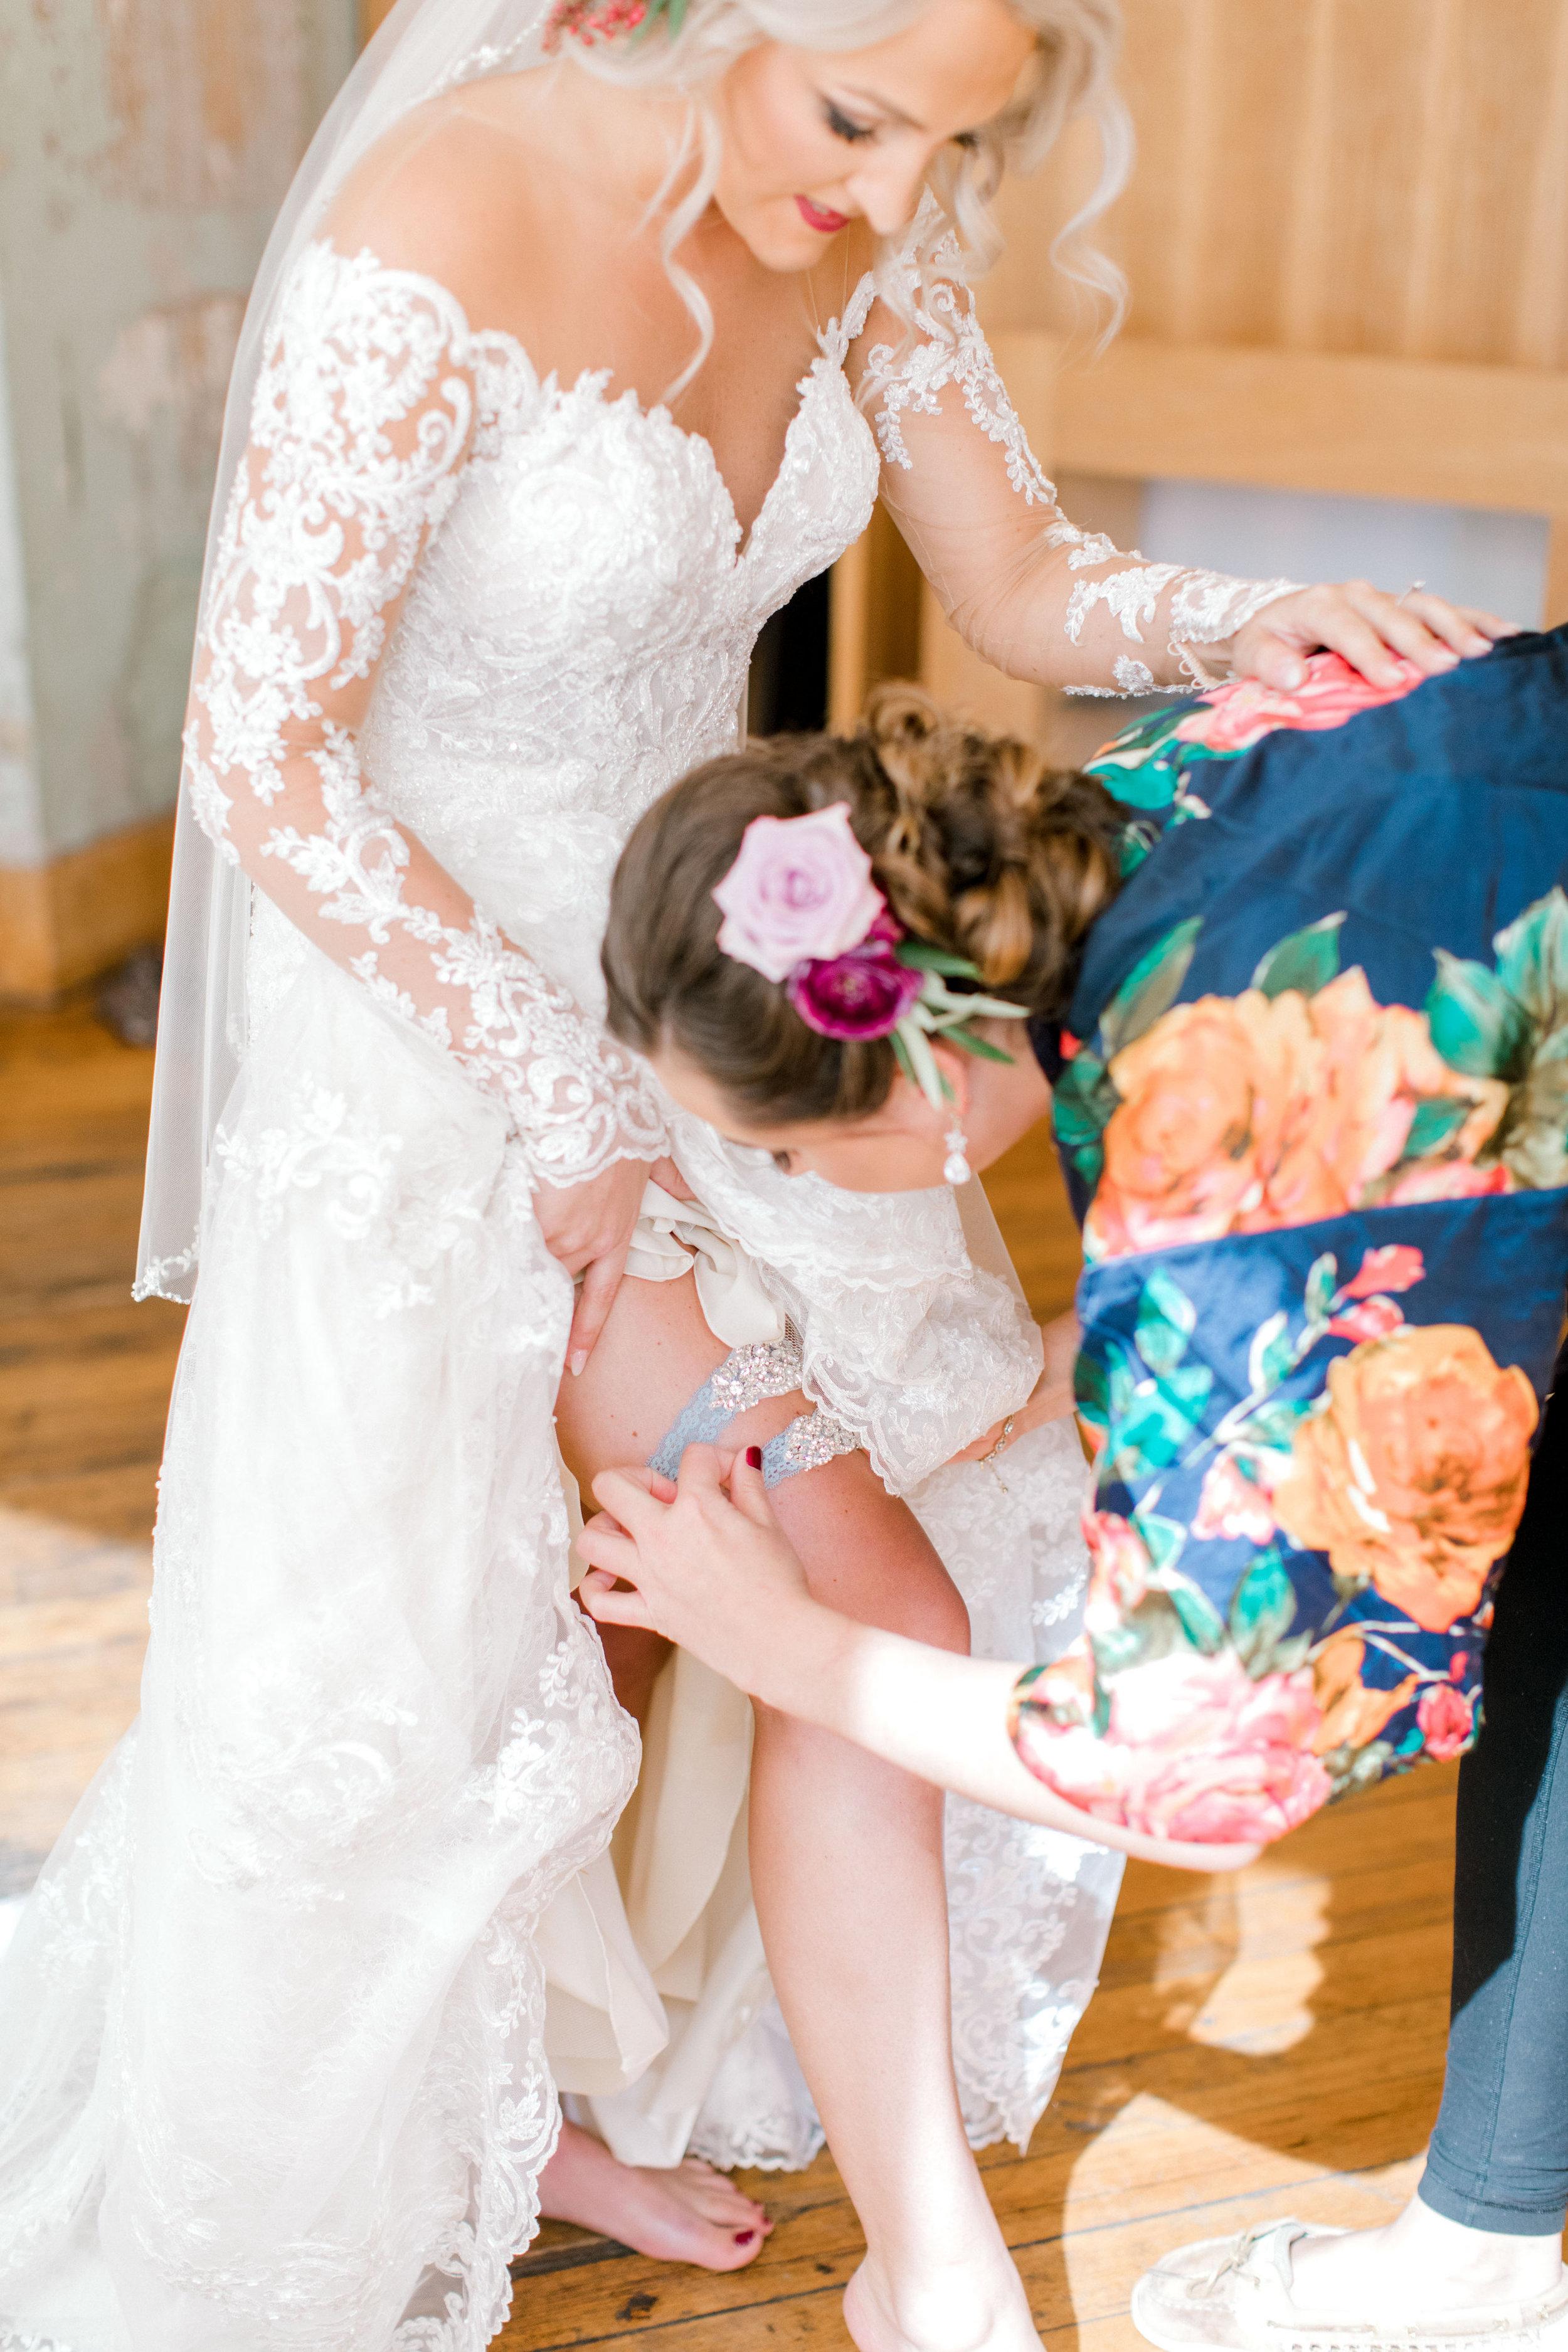 Ryan Alexa Married-Getting Ready First Look-0103.jpg